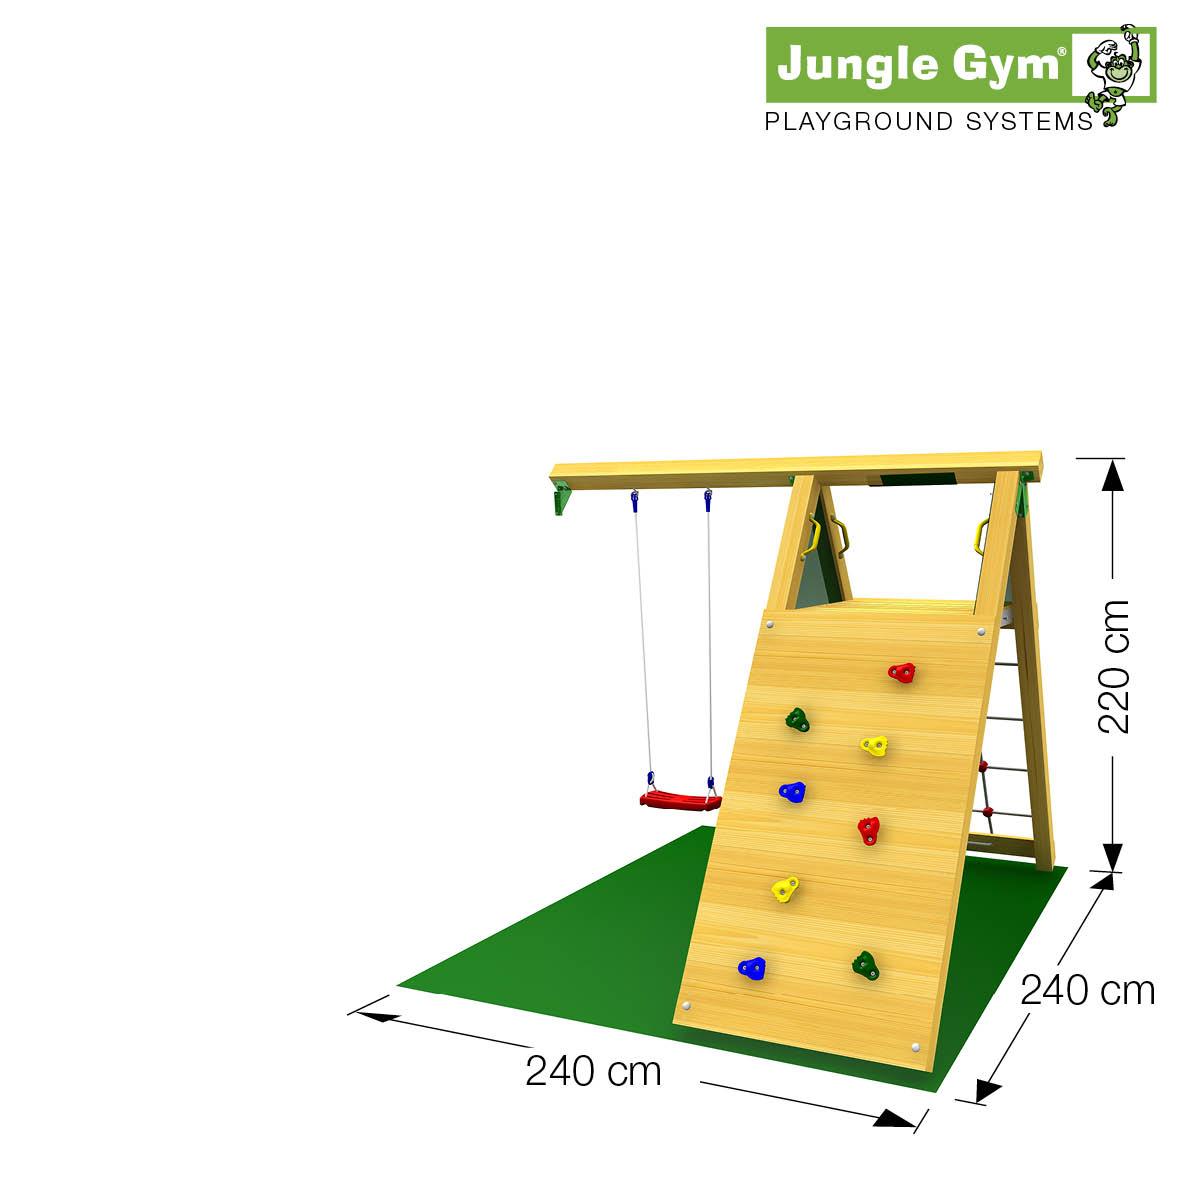 850_230_1581_Climb_Module_Xtra_10x10